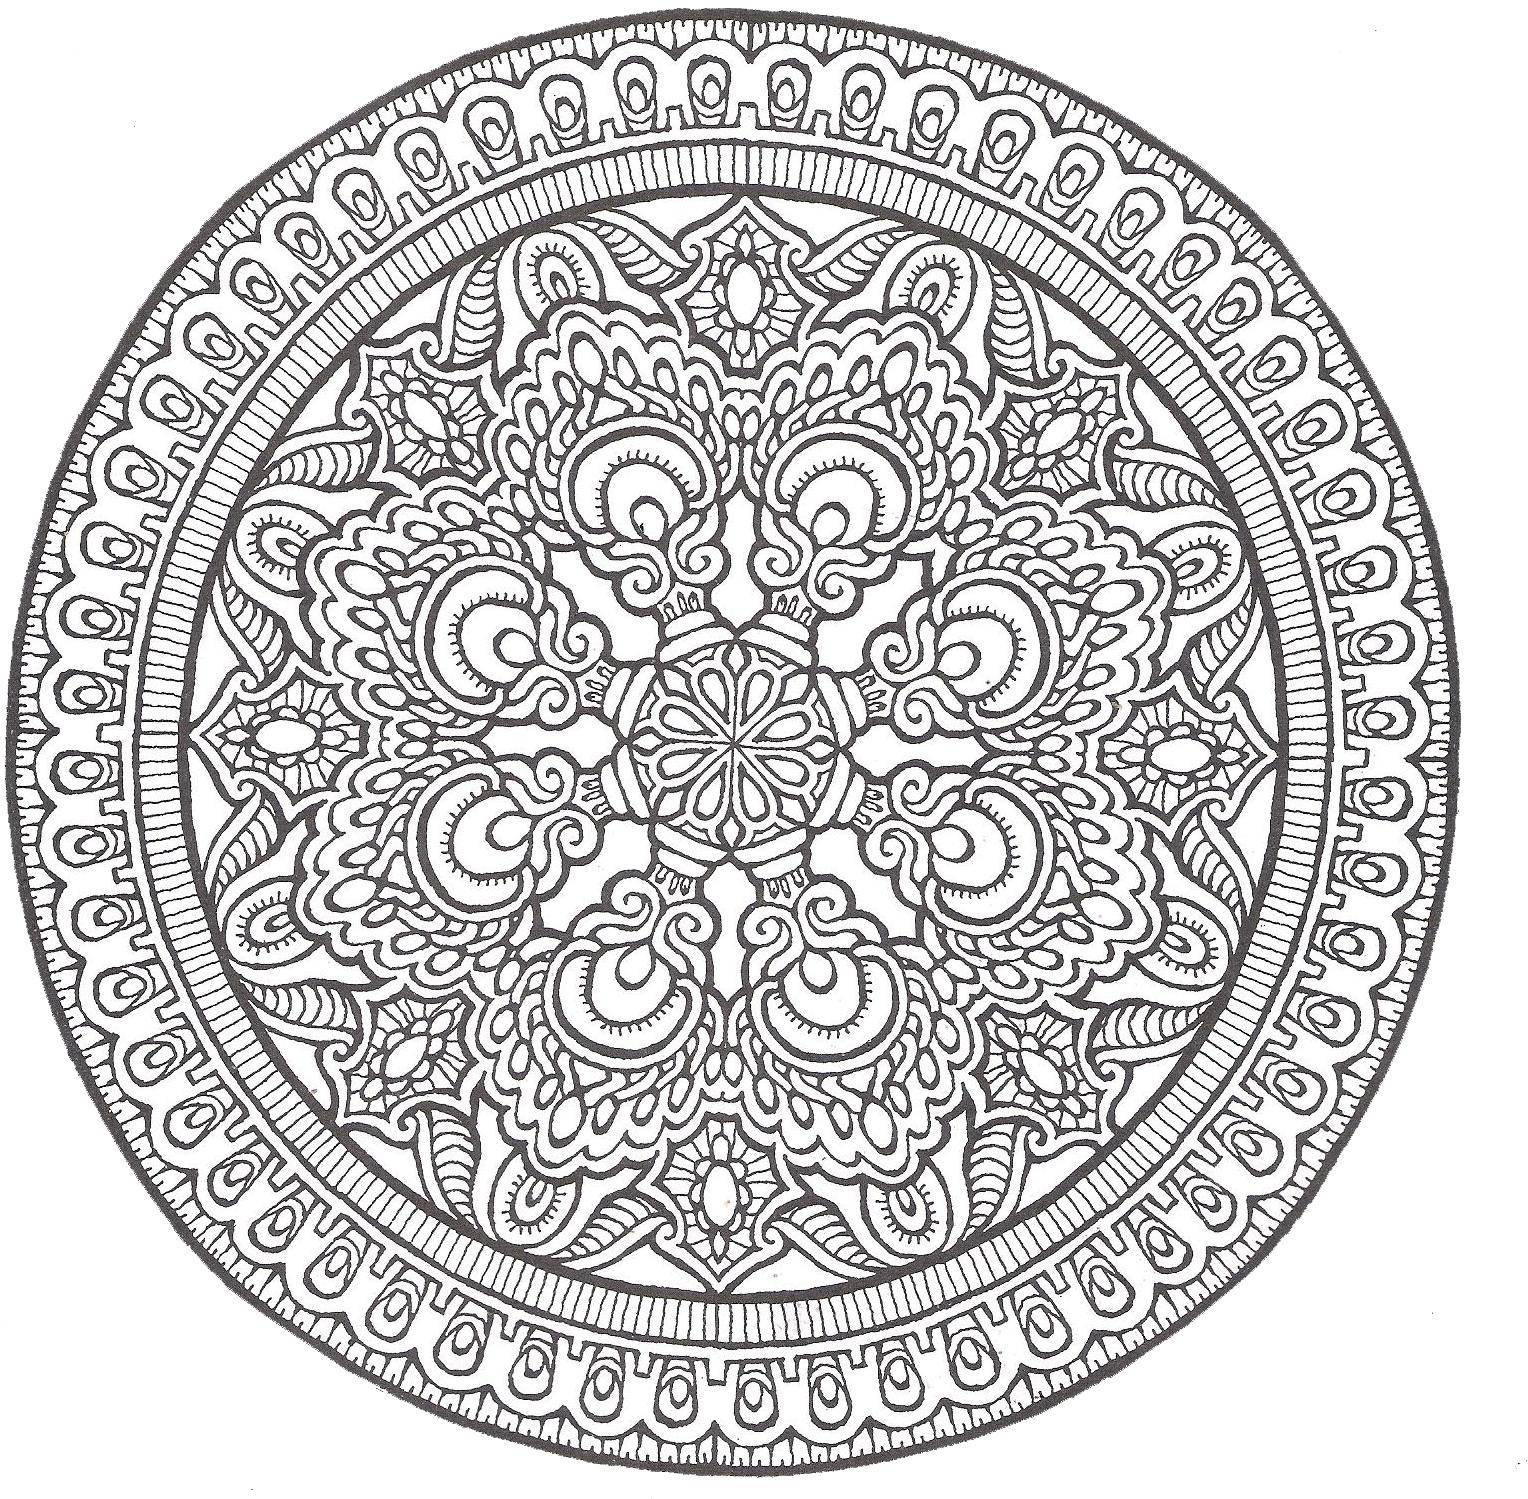 Free Advanced Mandala Coloring Pages Printable Download Free Clip Art Free Clip Art On Clipart Library